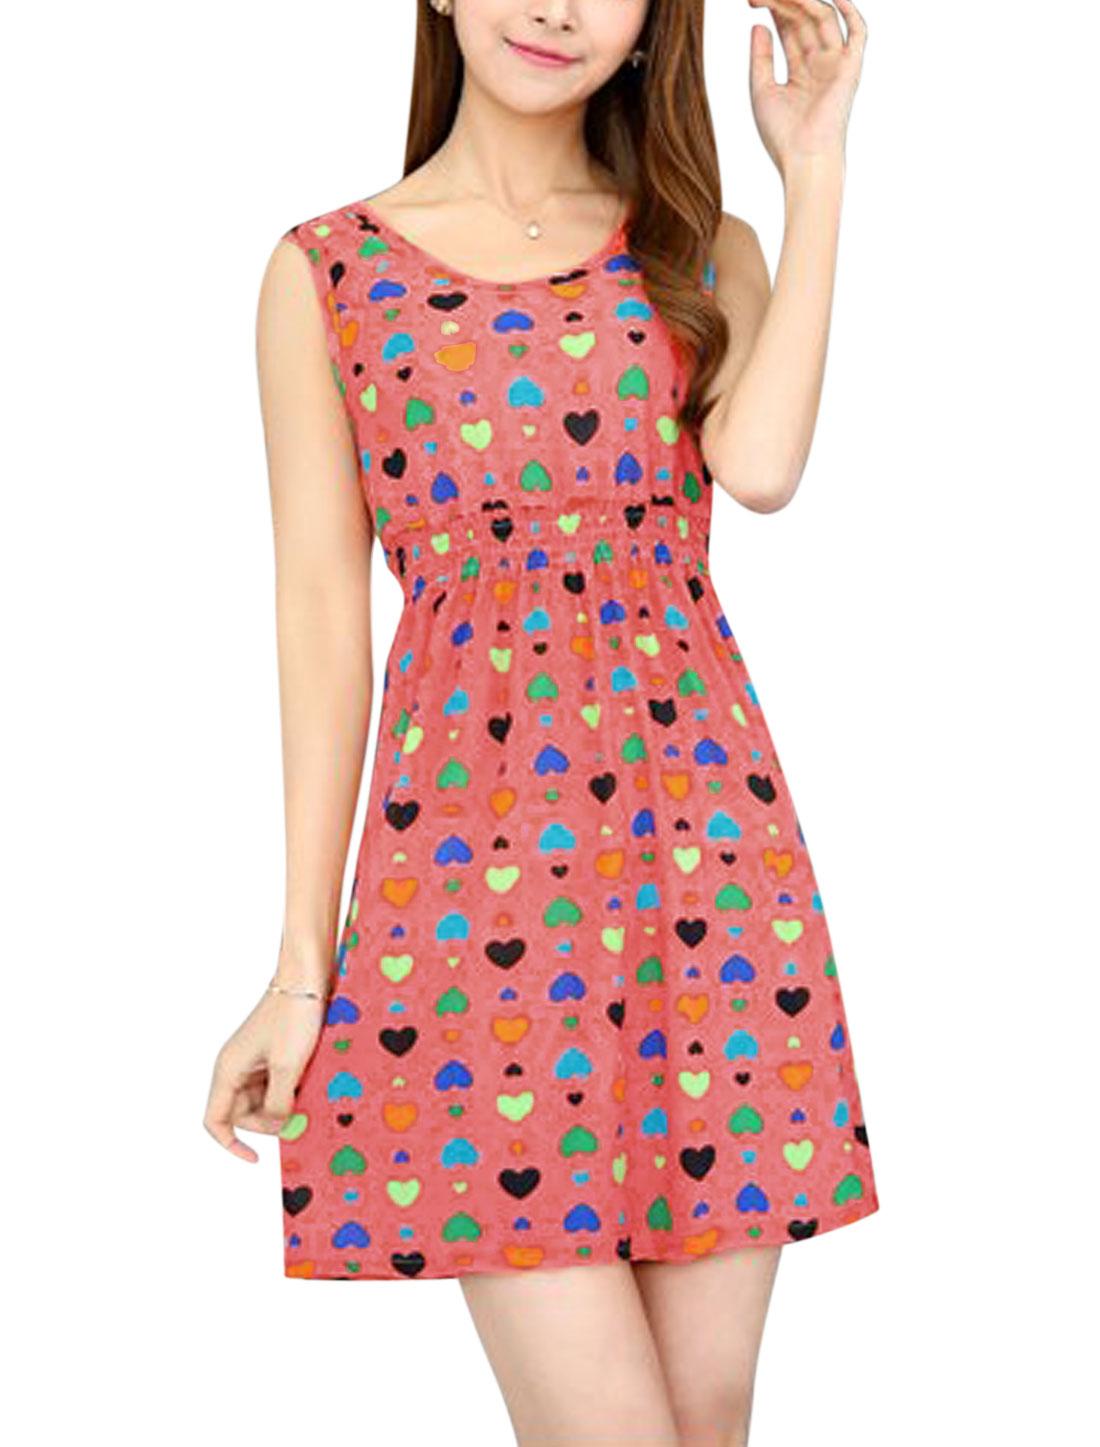 Women Round Neck Elastic Waist Hearts Print Mini Dress Pale Red XS